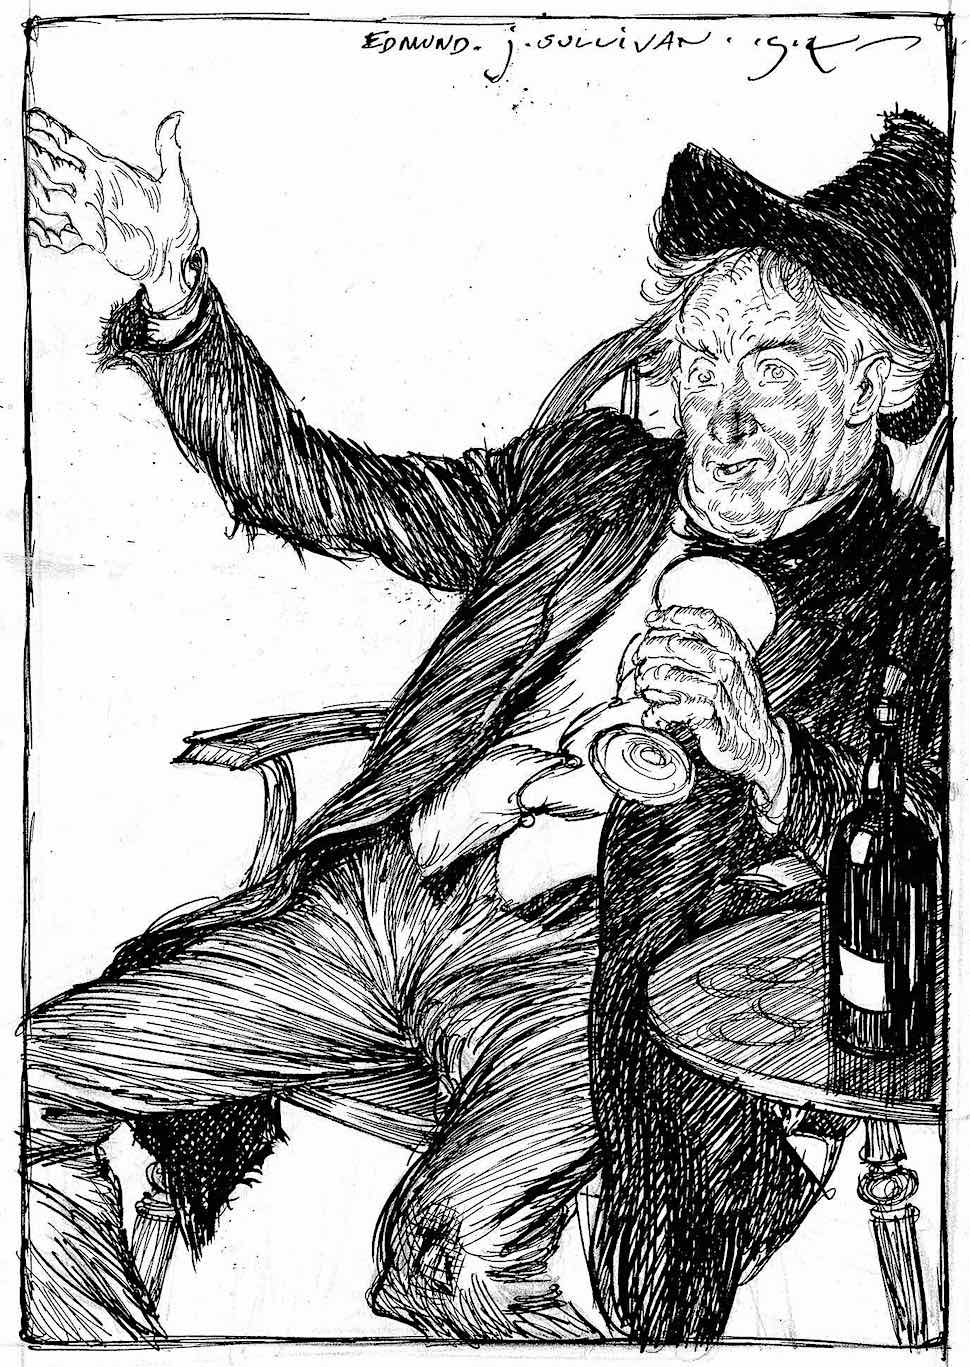 a 1914 Edmund J. Sullivan illustration of a foolish drunk's loud opinion